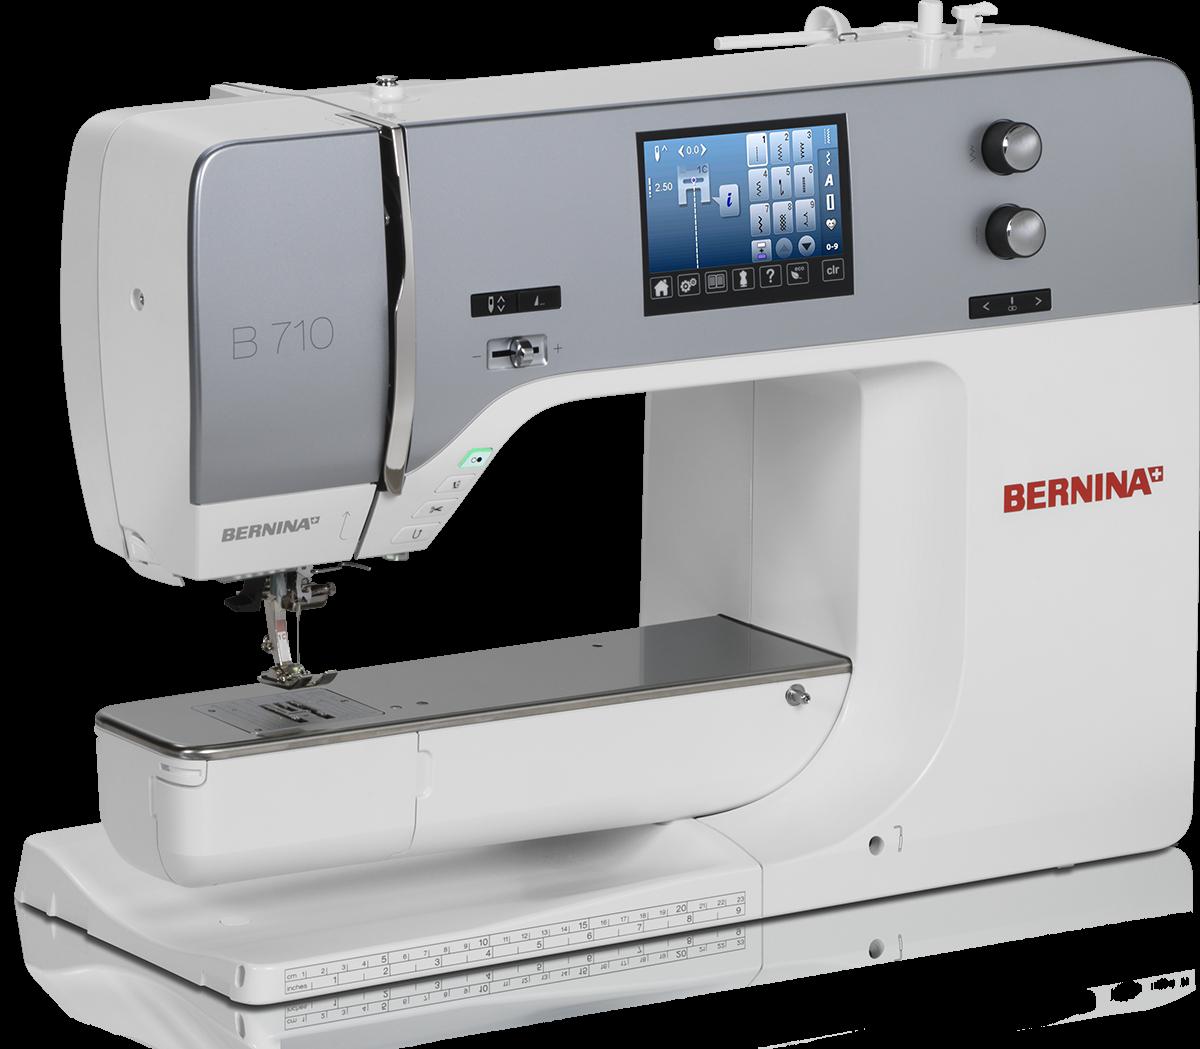 Bernina 710 (Pre-Owned)